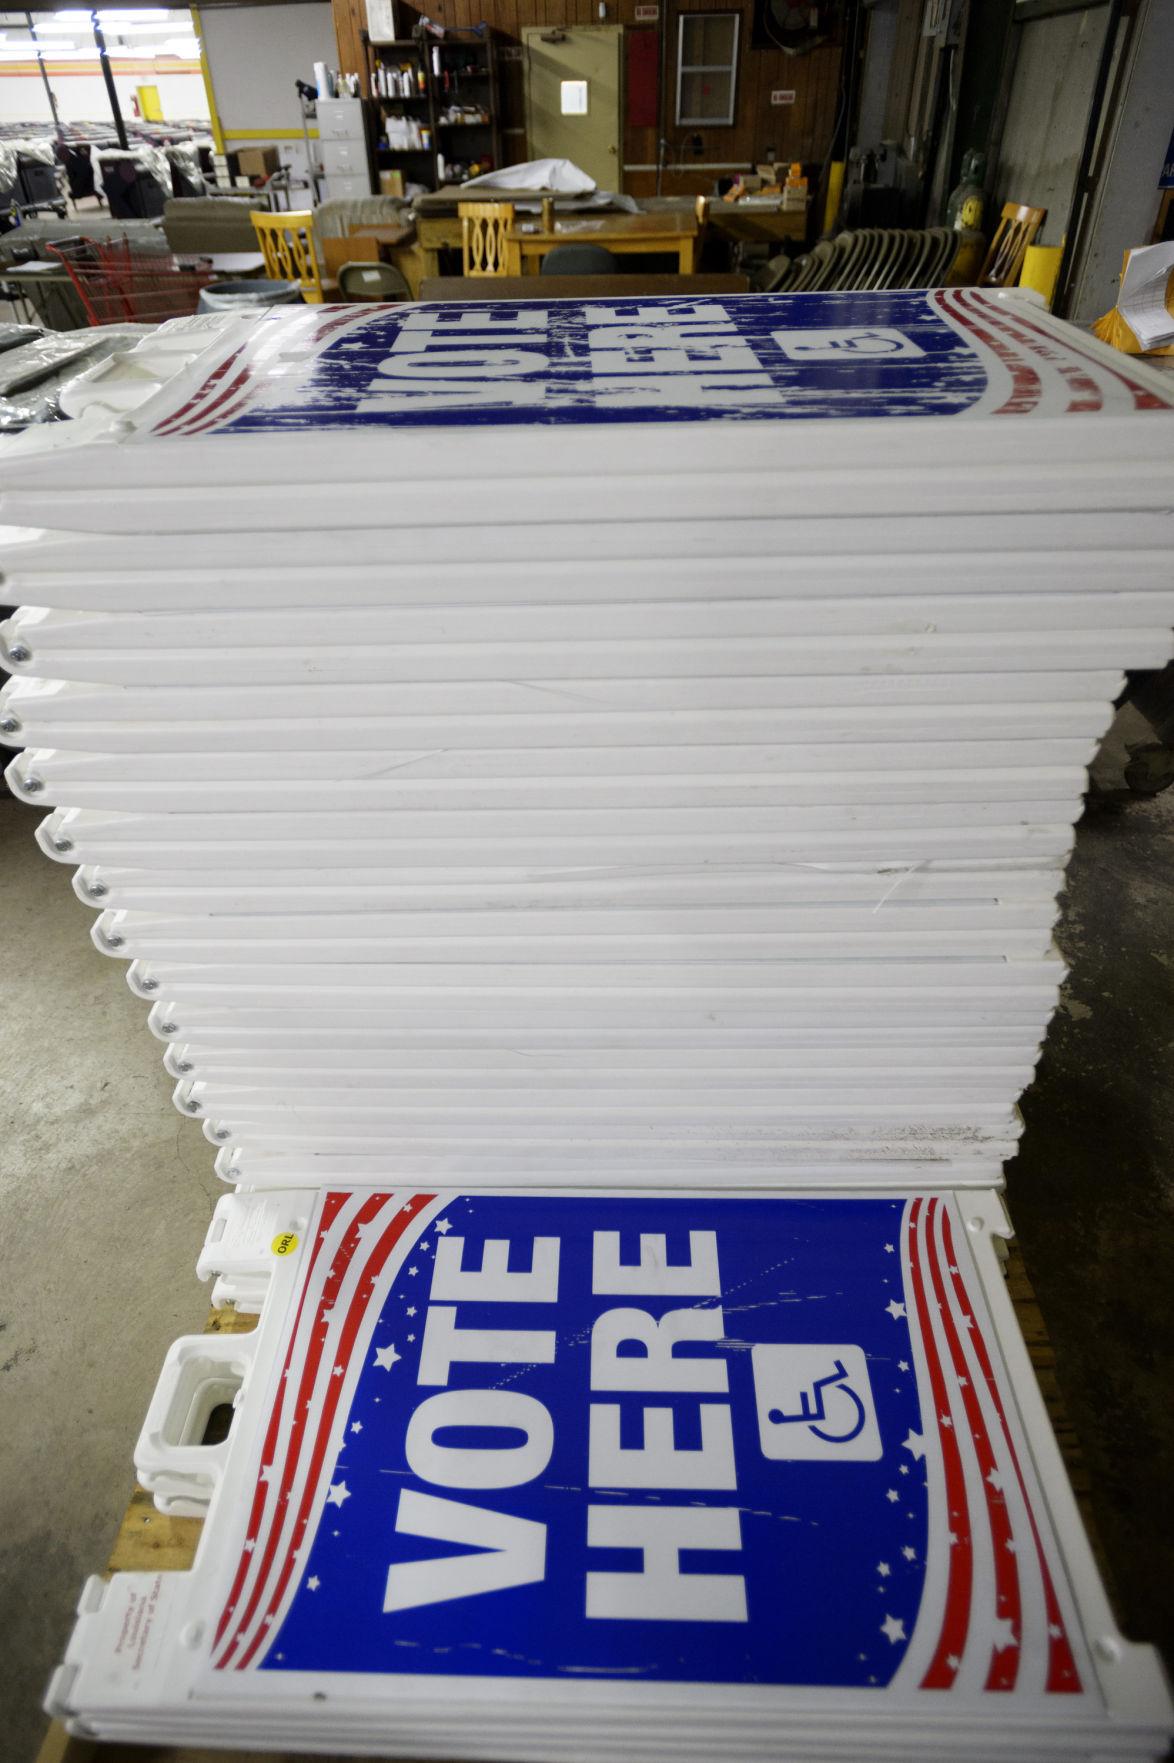 NO.pollingmachines.101417.0004.JPG